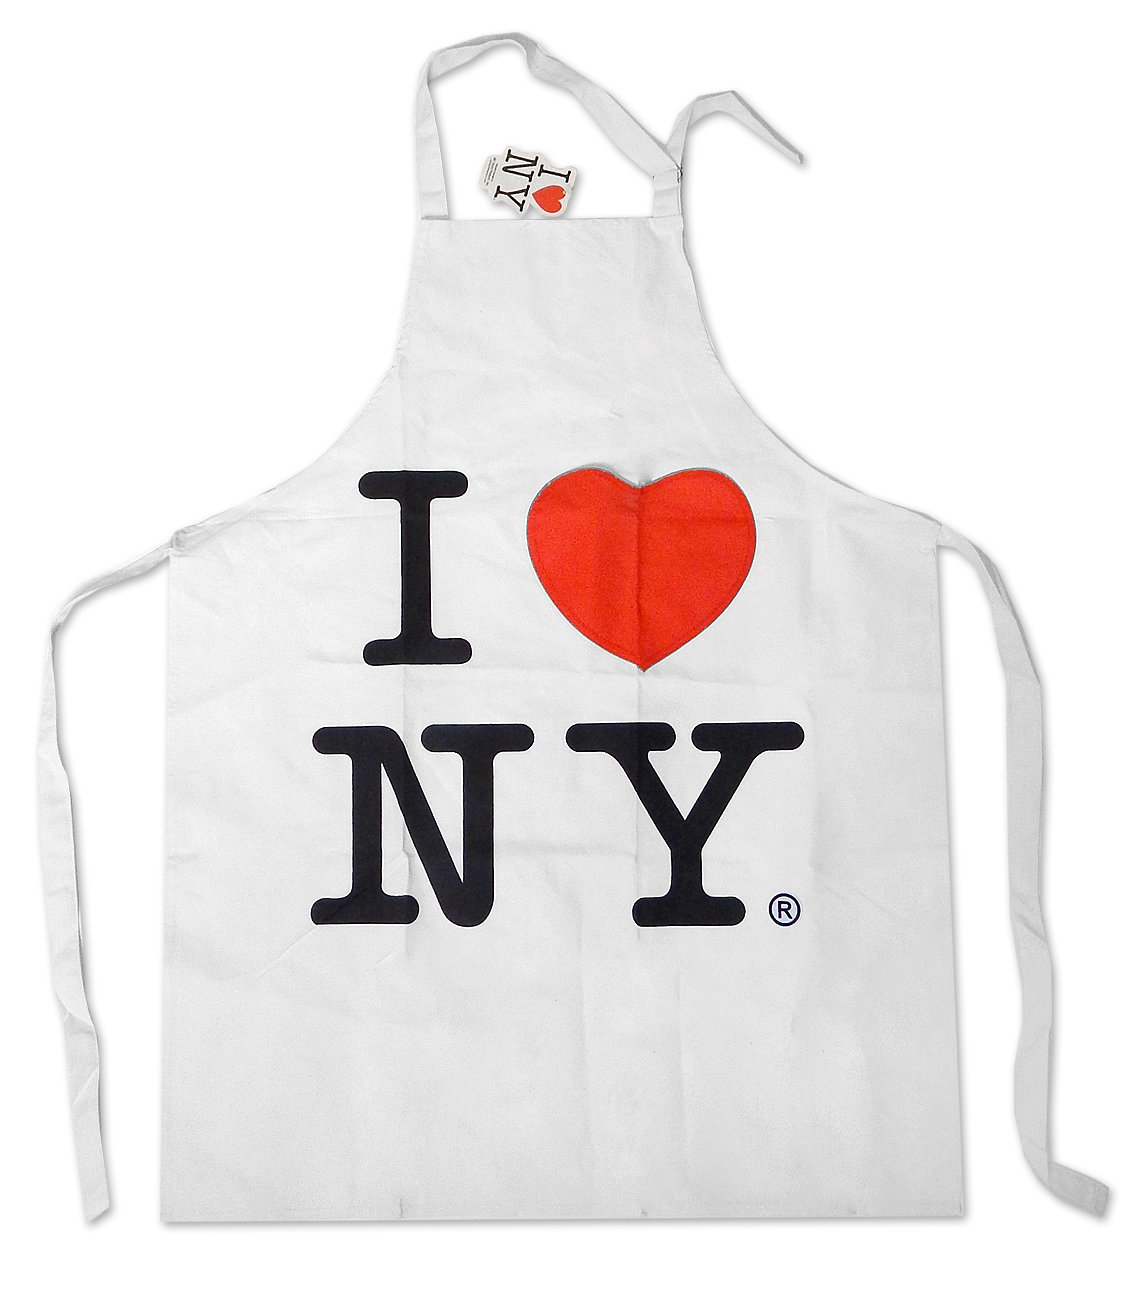 S & T World Products, Inc I Love Ny White Canvas Apron with Heart Pocket